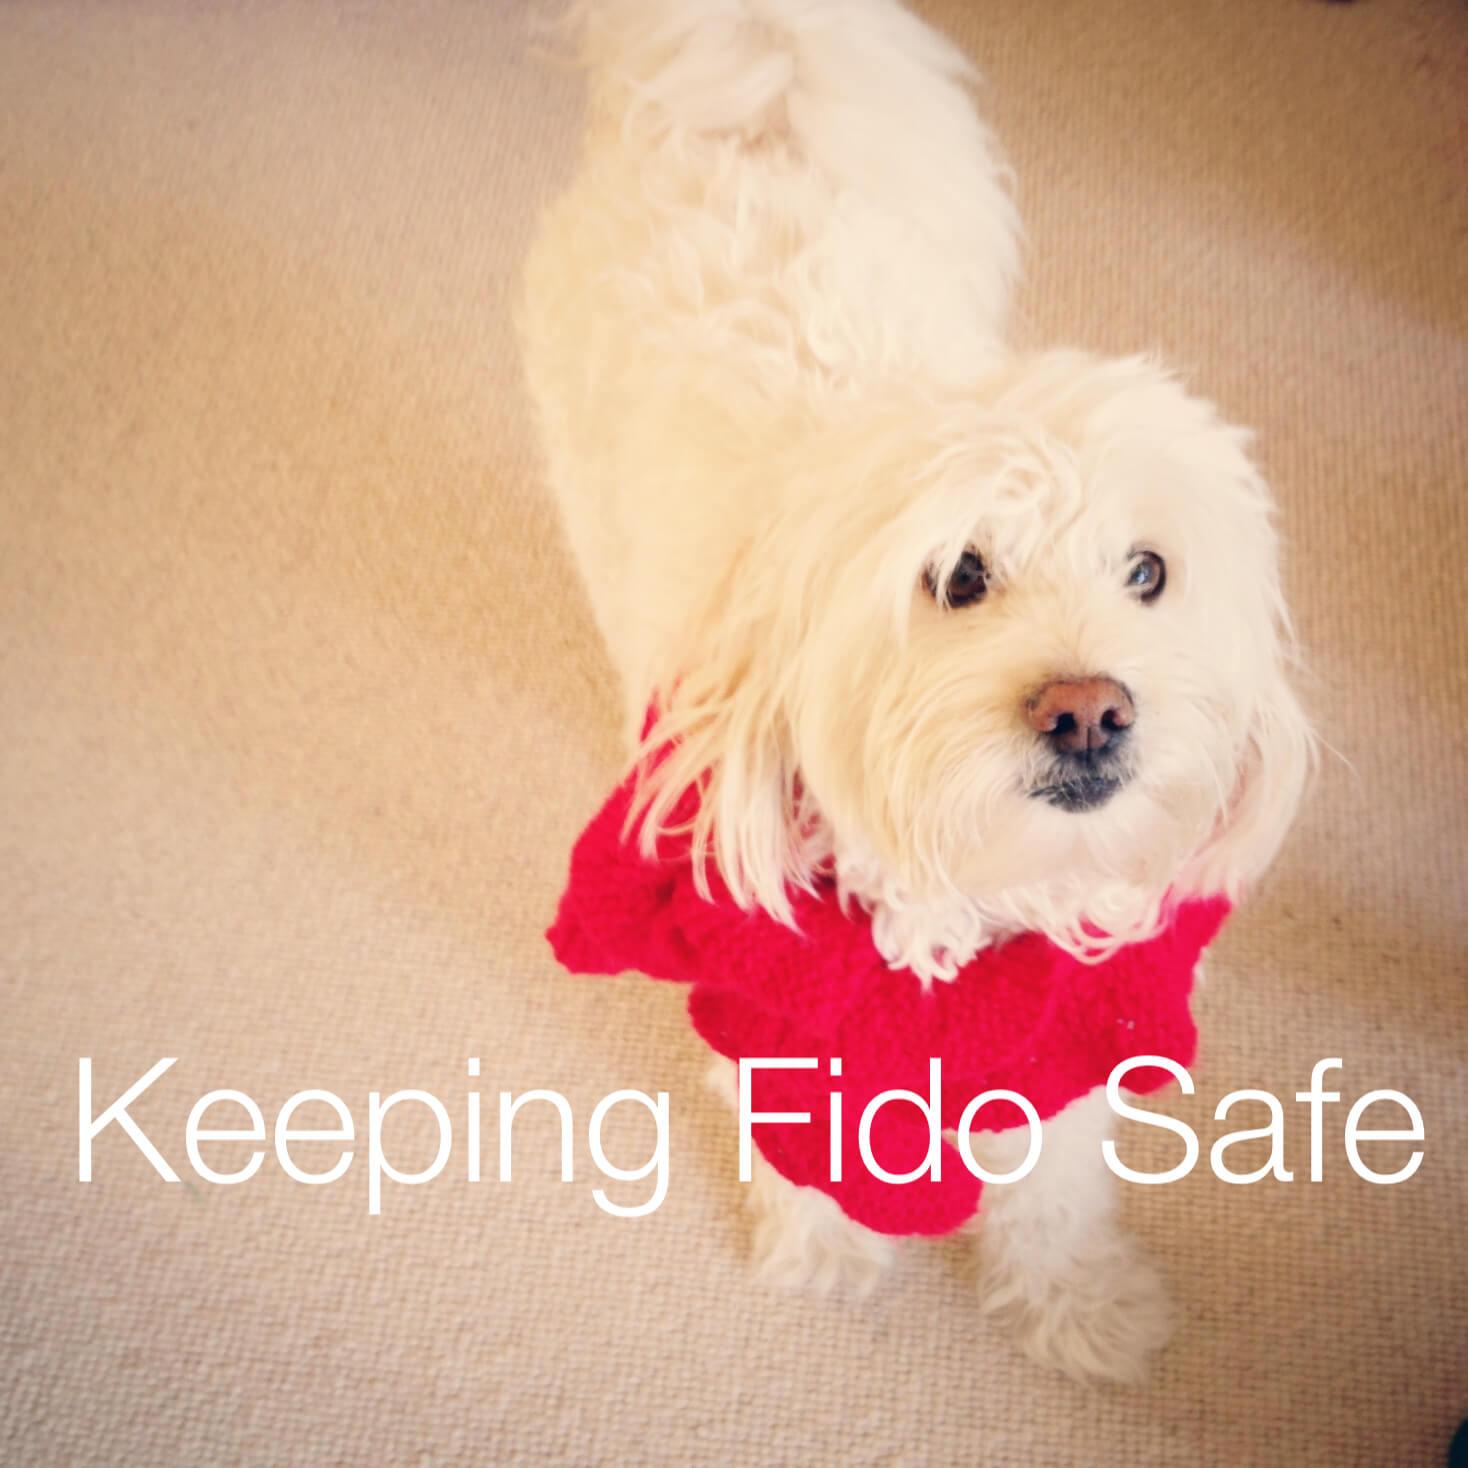 preventing pet theft